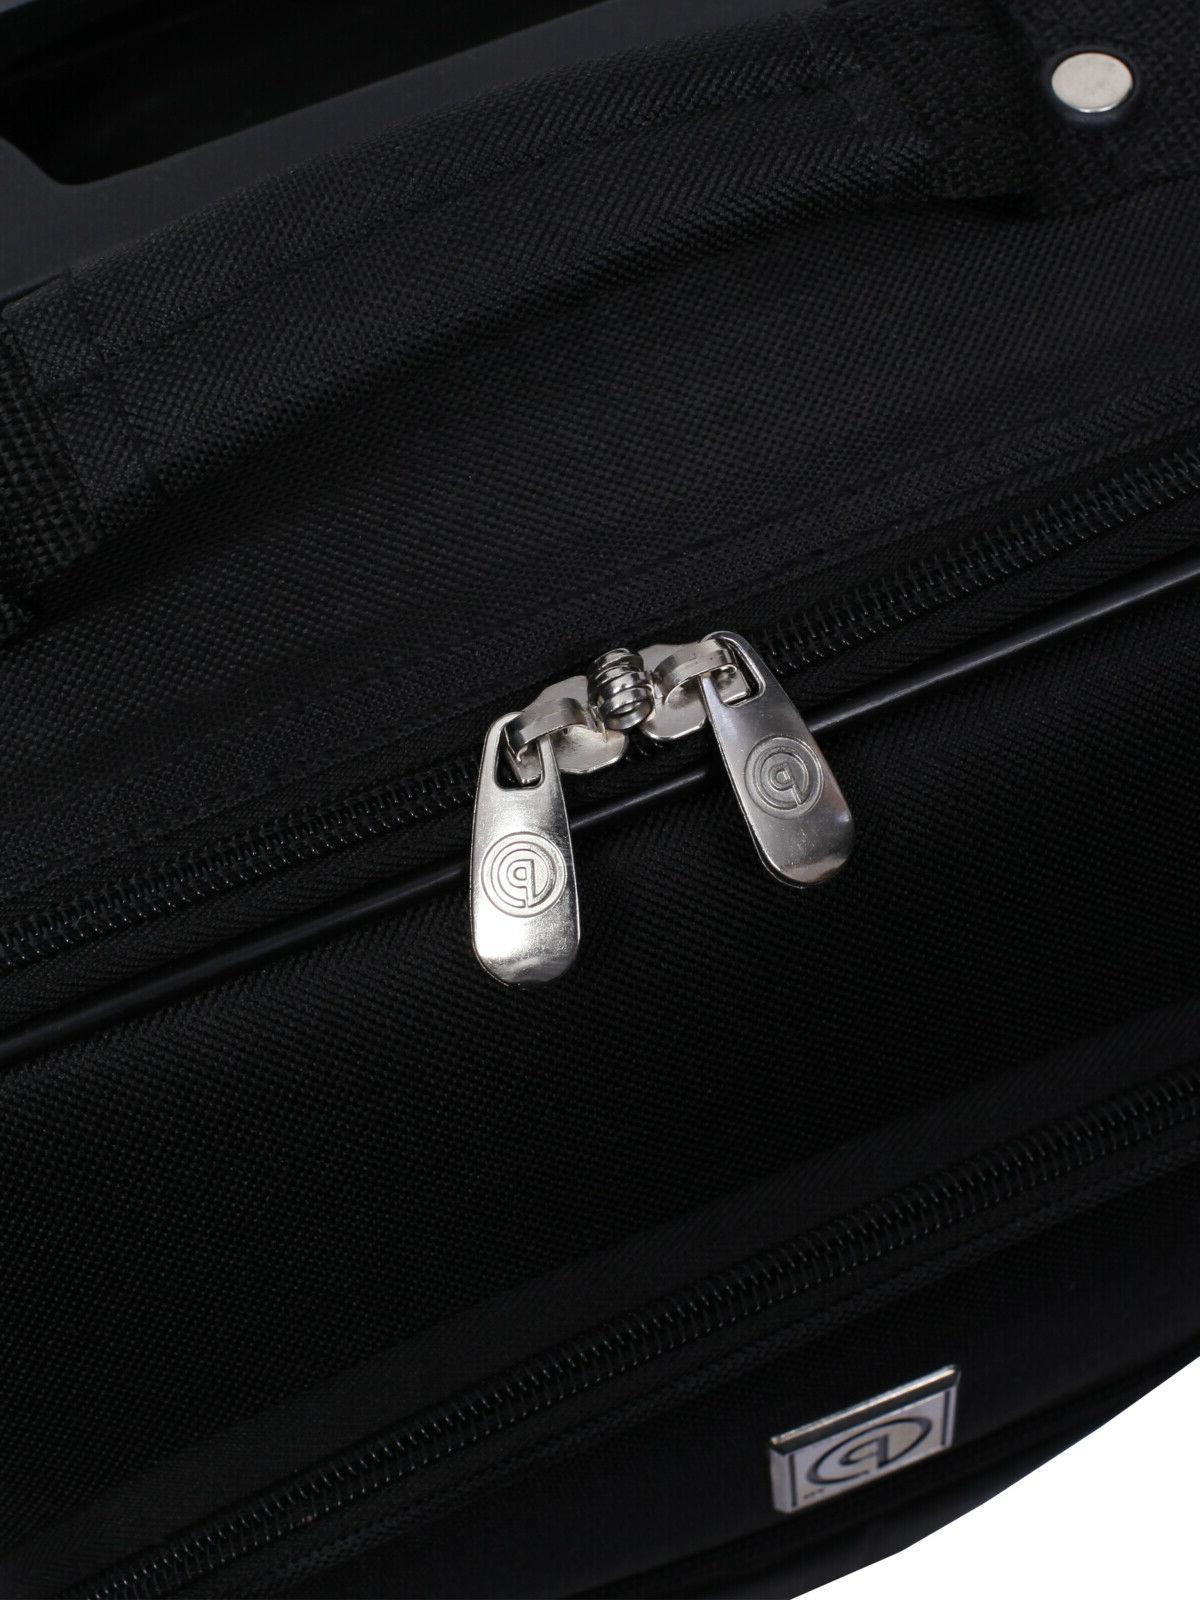 Pilot Case Carry-On Suitcase Upright Luggage